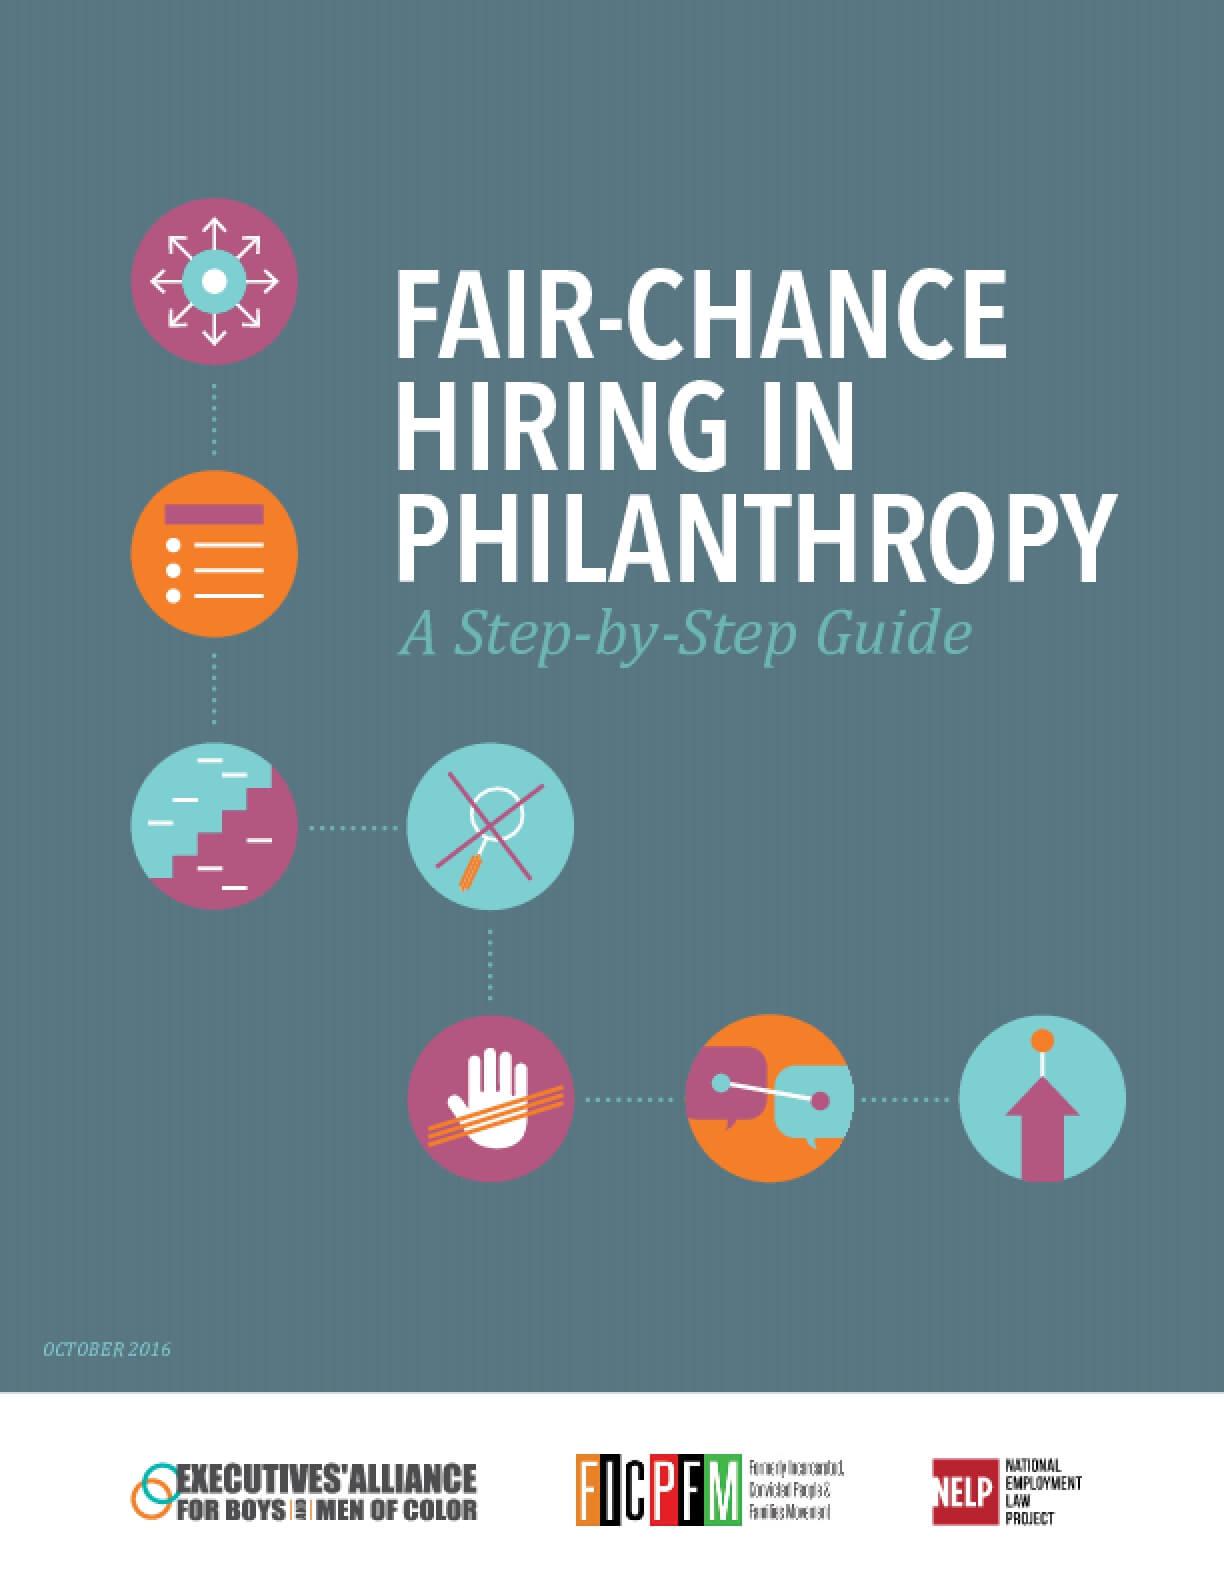 Fair-Chance Hiring in Philanthropy: A Step-by-Step Guide